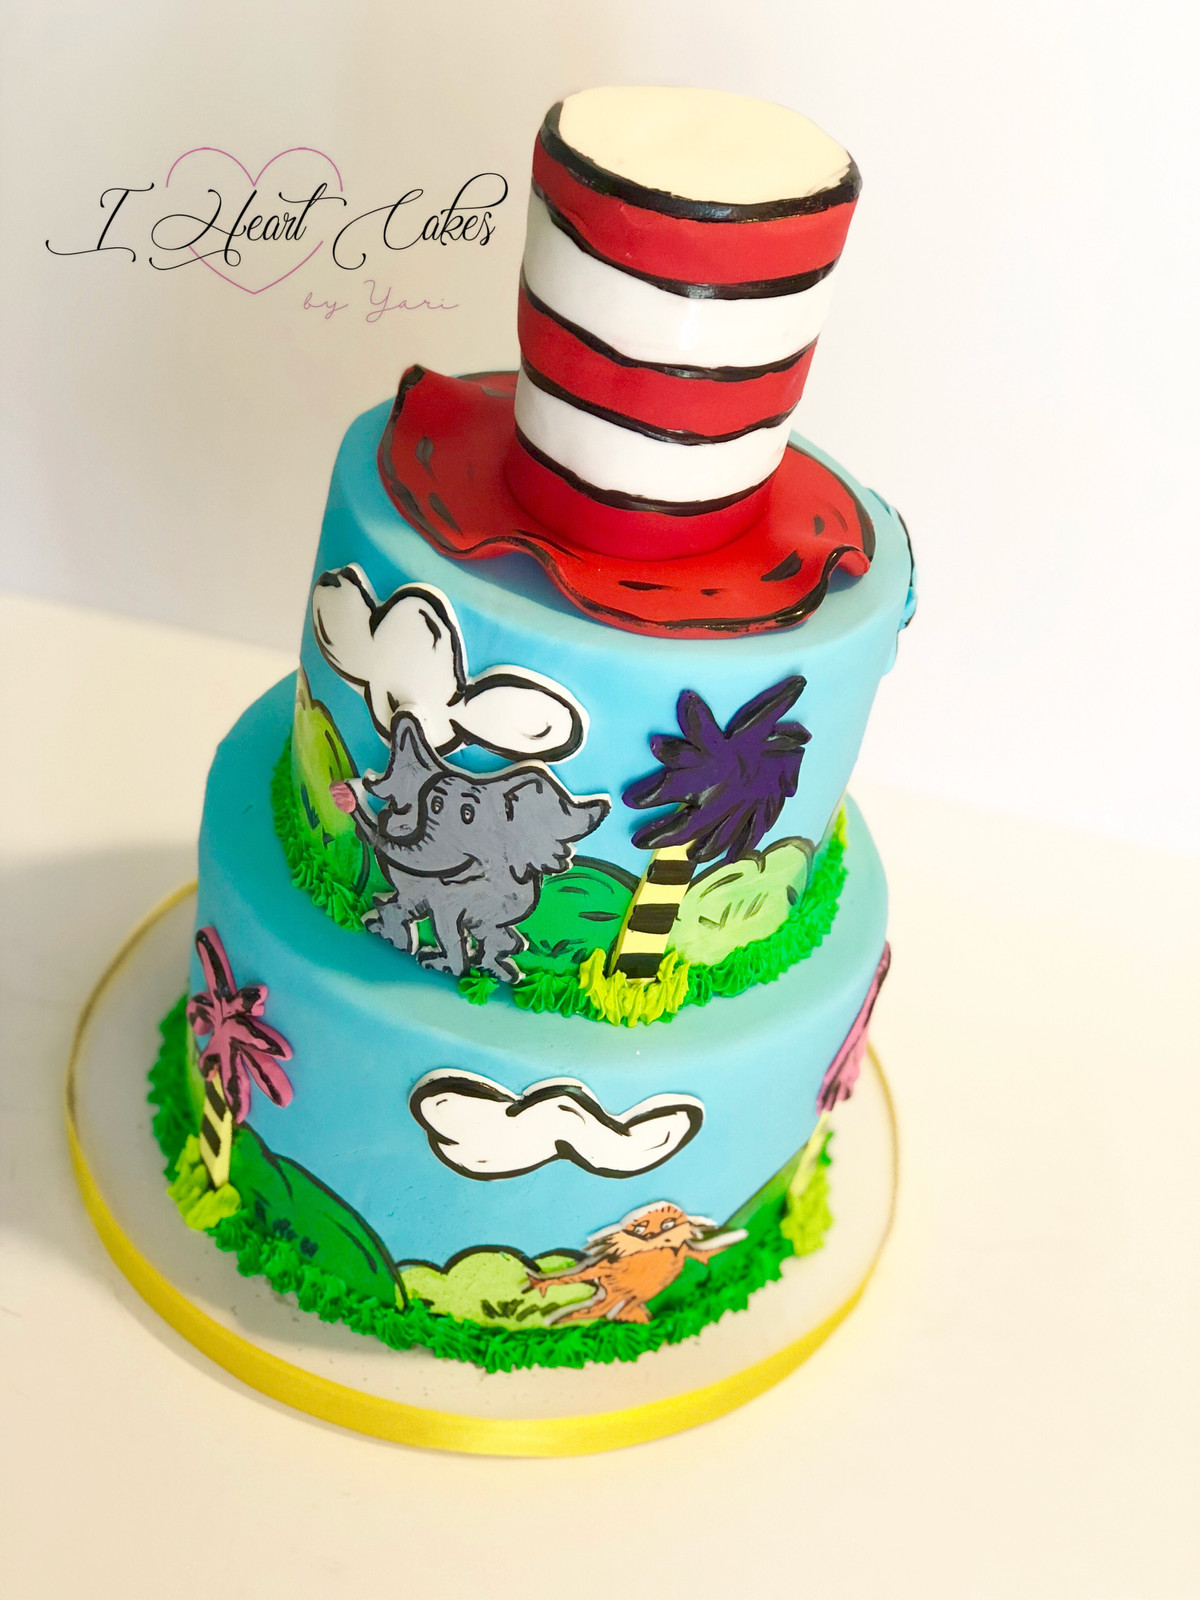 Birthday Cakes In Orlando Fl I Heart By Yari